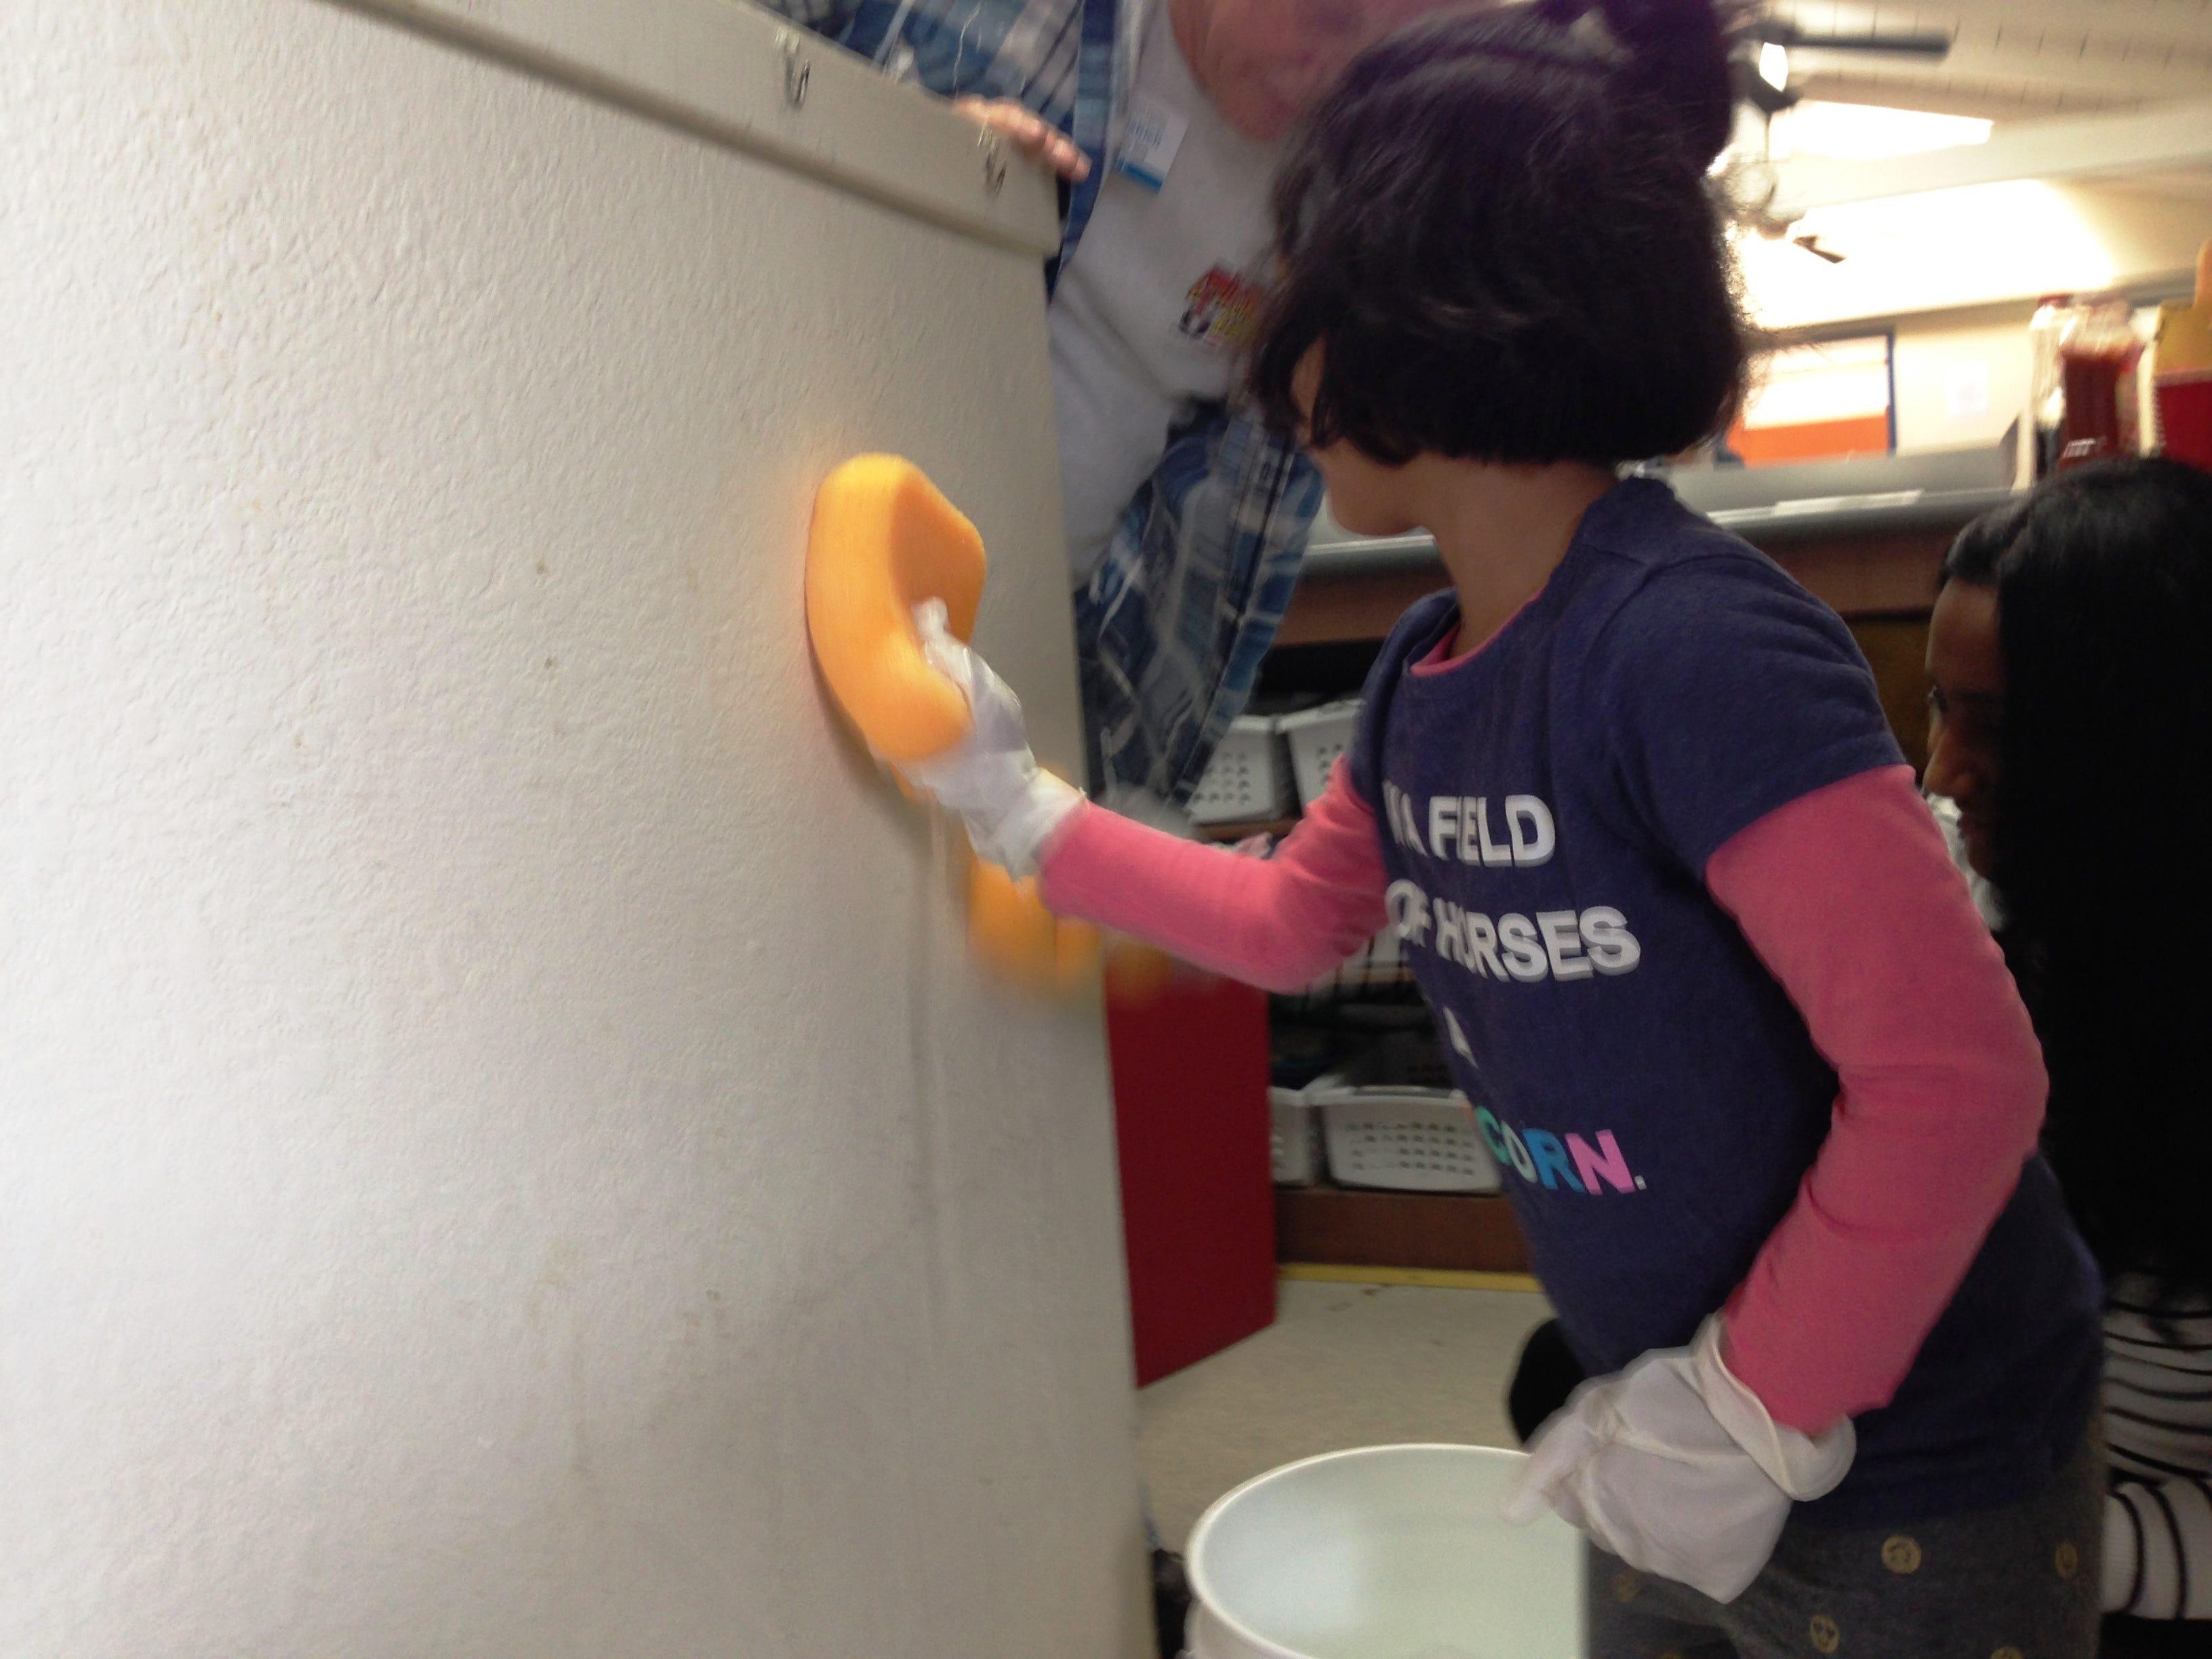 Arisha Sambari washes a wall inside the multi-purpose room at the Simi Valley Samaritan Center during Community Volunteer Day on Saturday.